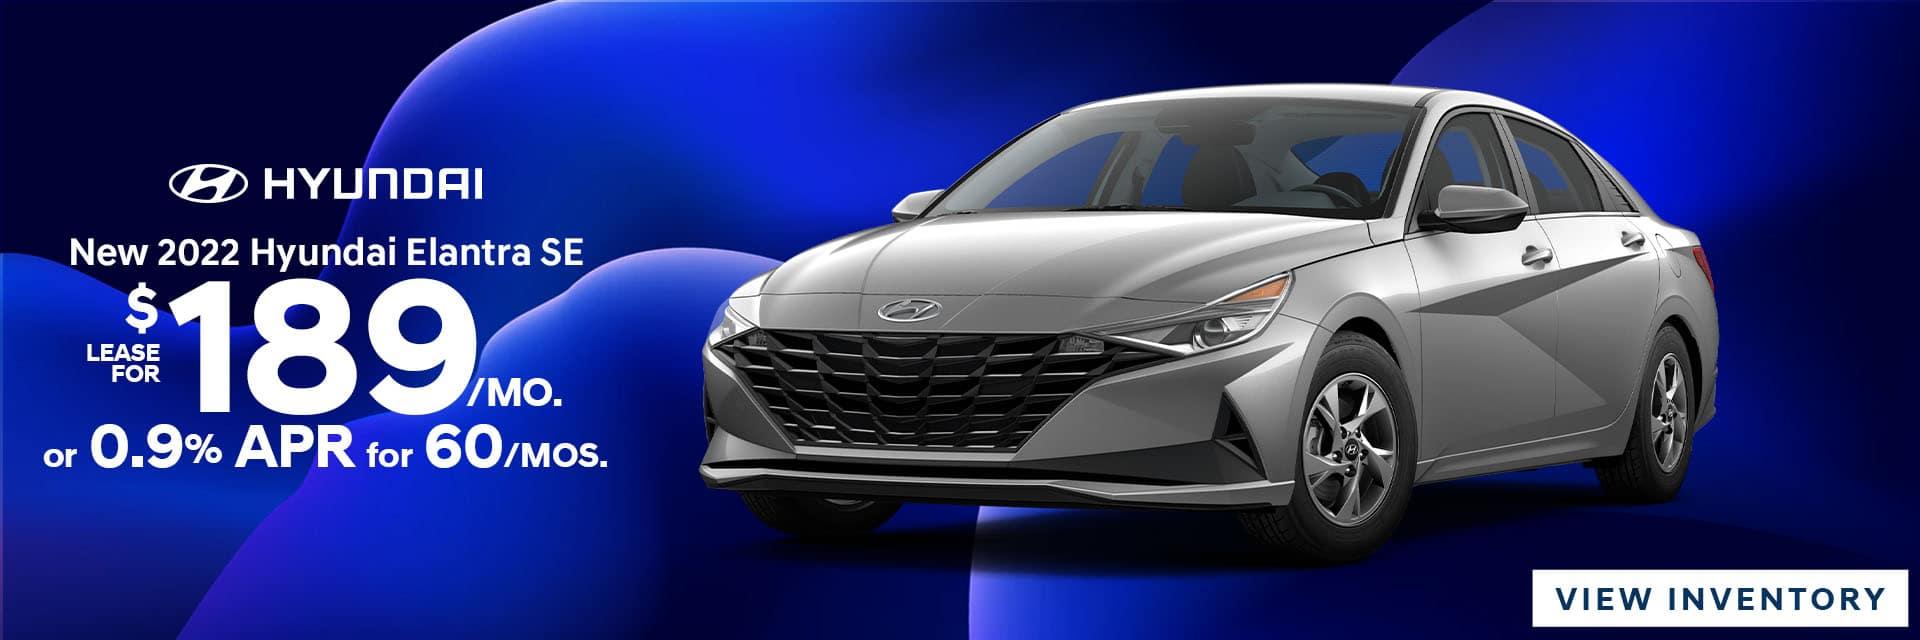 CHOH-September 20212021 Hyundai Elantra copy